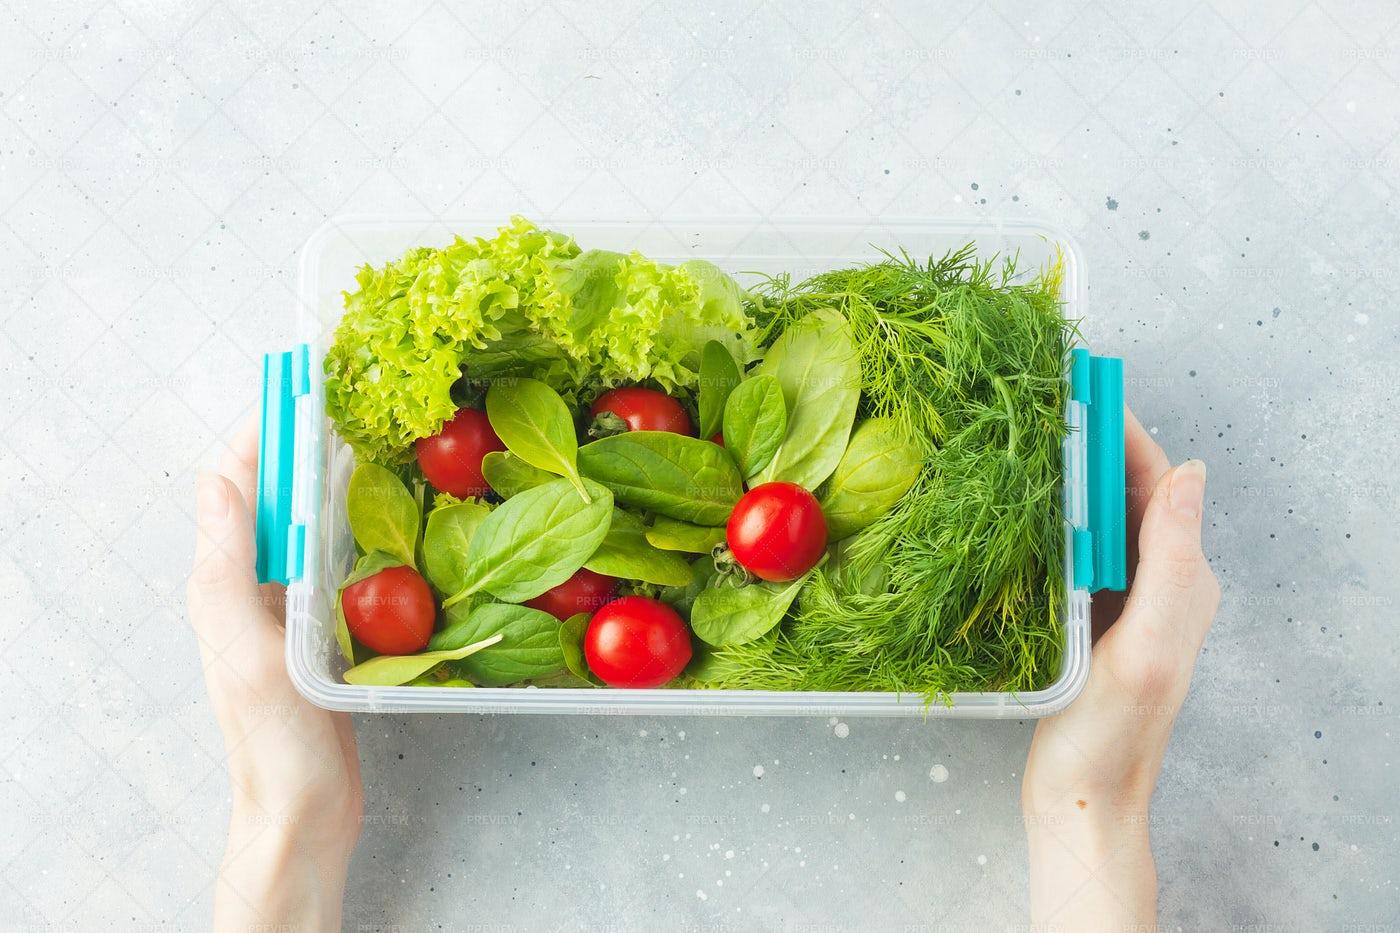 Fresh Greens: Stock Photos